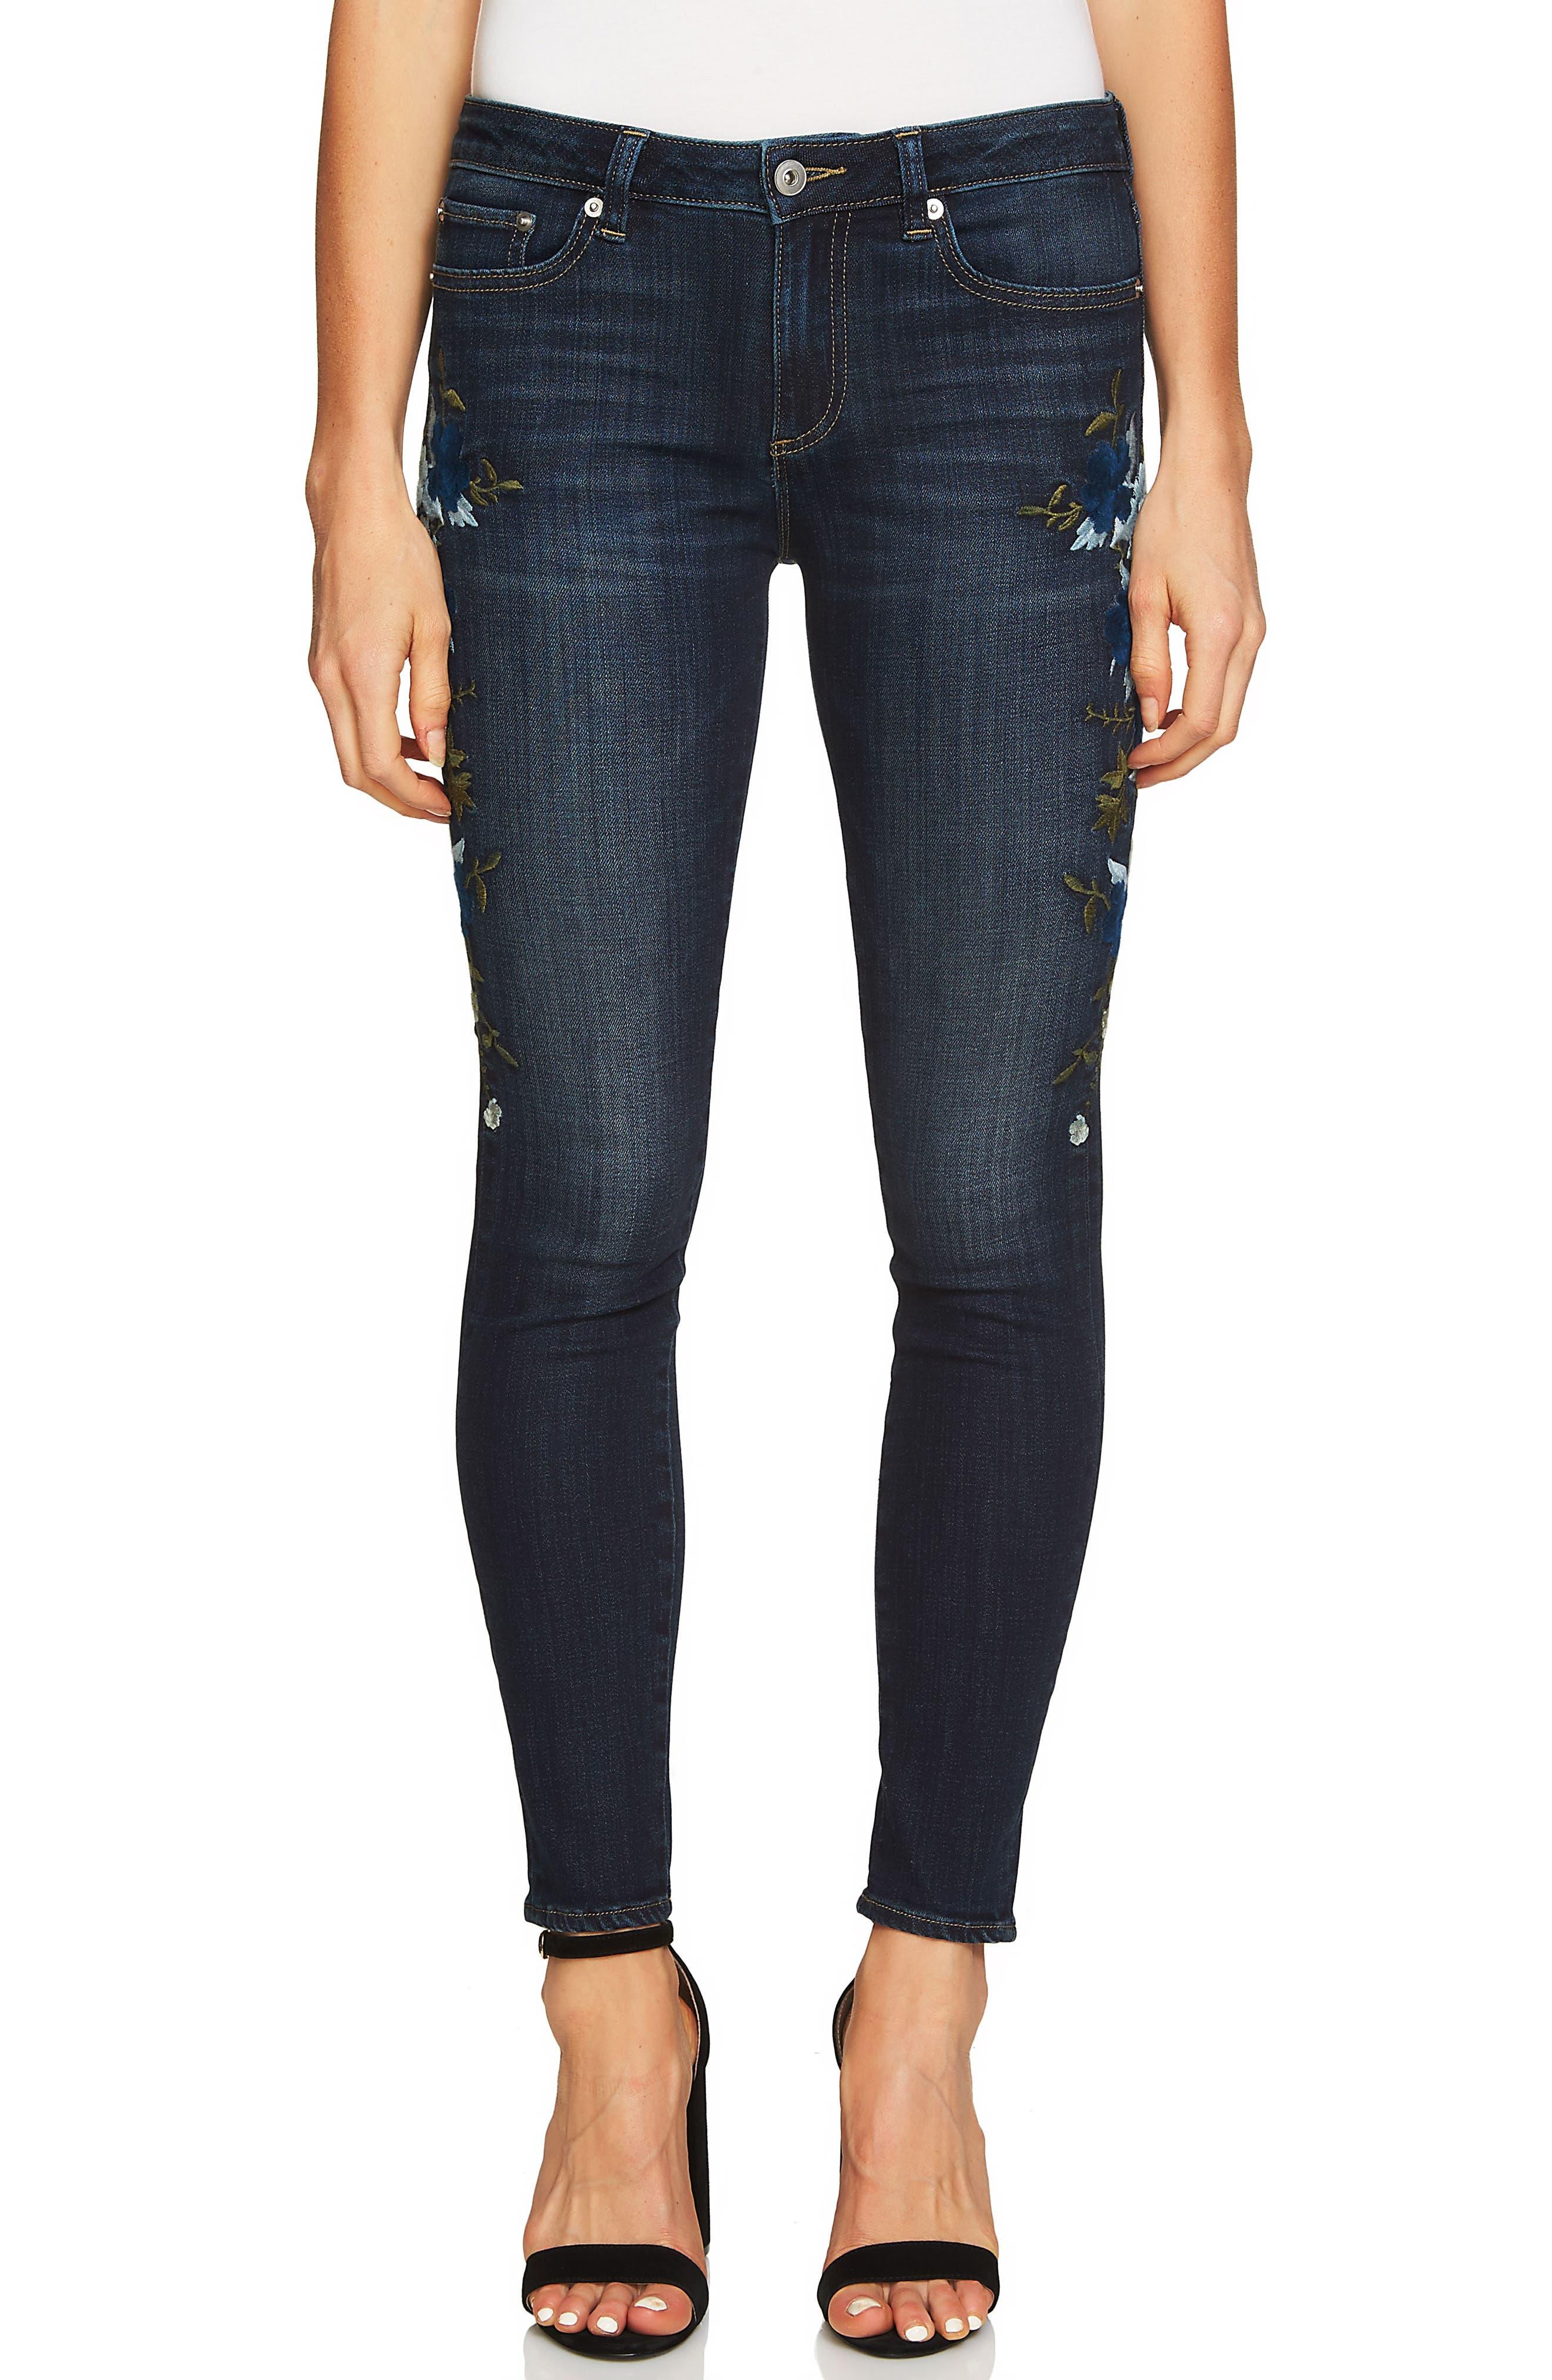 Main Image - CeCe Indigo Denim Floral Embroidered Jeans